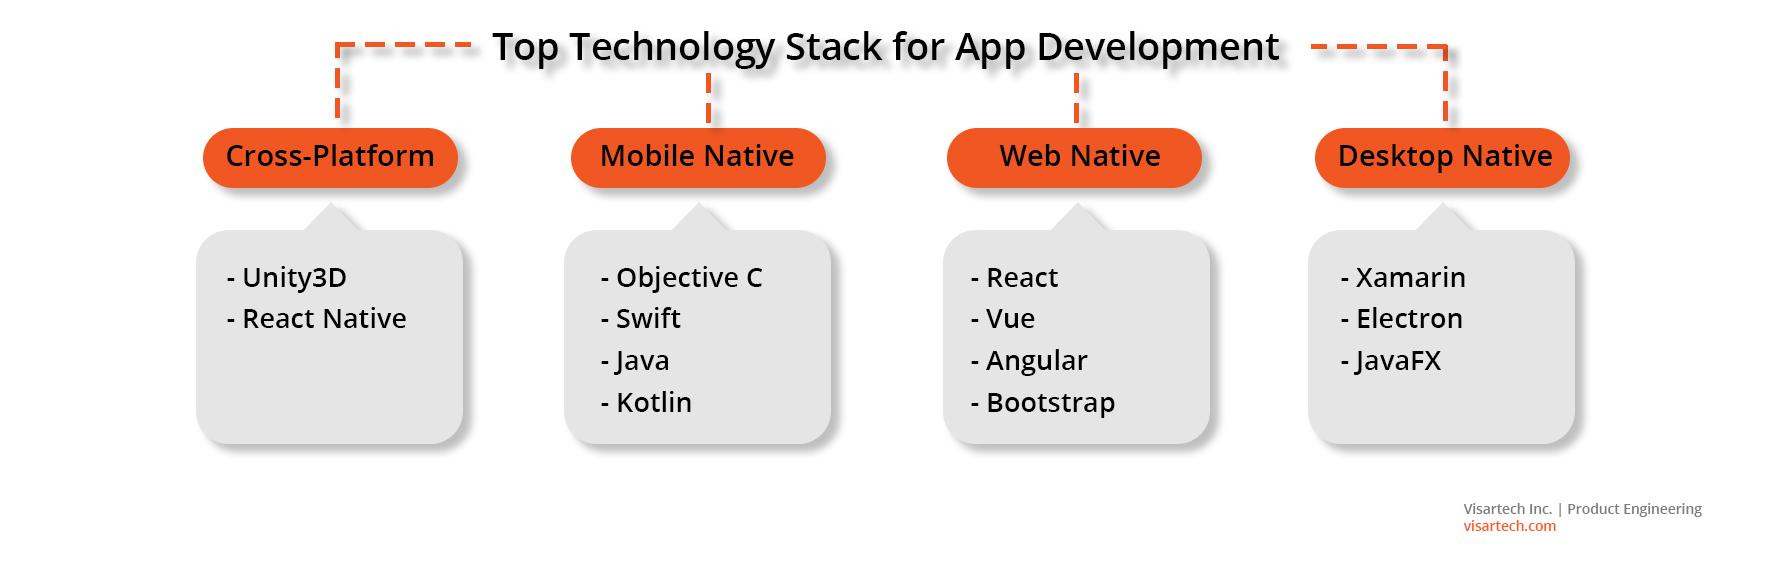 Top Technology Stack for App Development - Visartech Blog